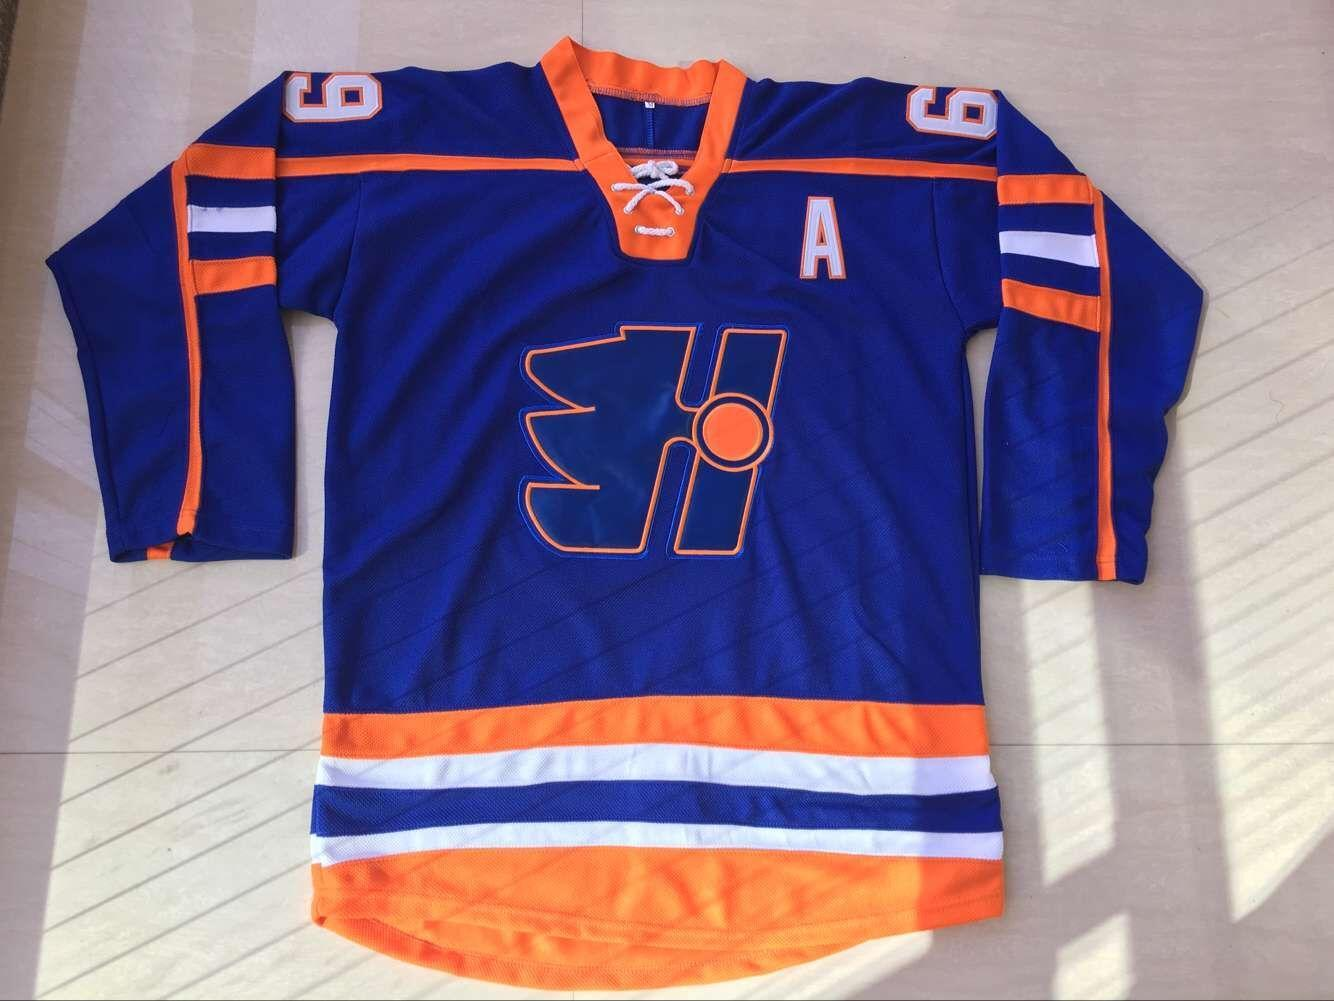 Ice Hockey Jersey Goon Doug Glatt Halifax #69 Movie Pullover Mens Sportwear Tops